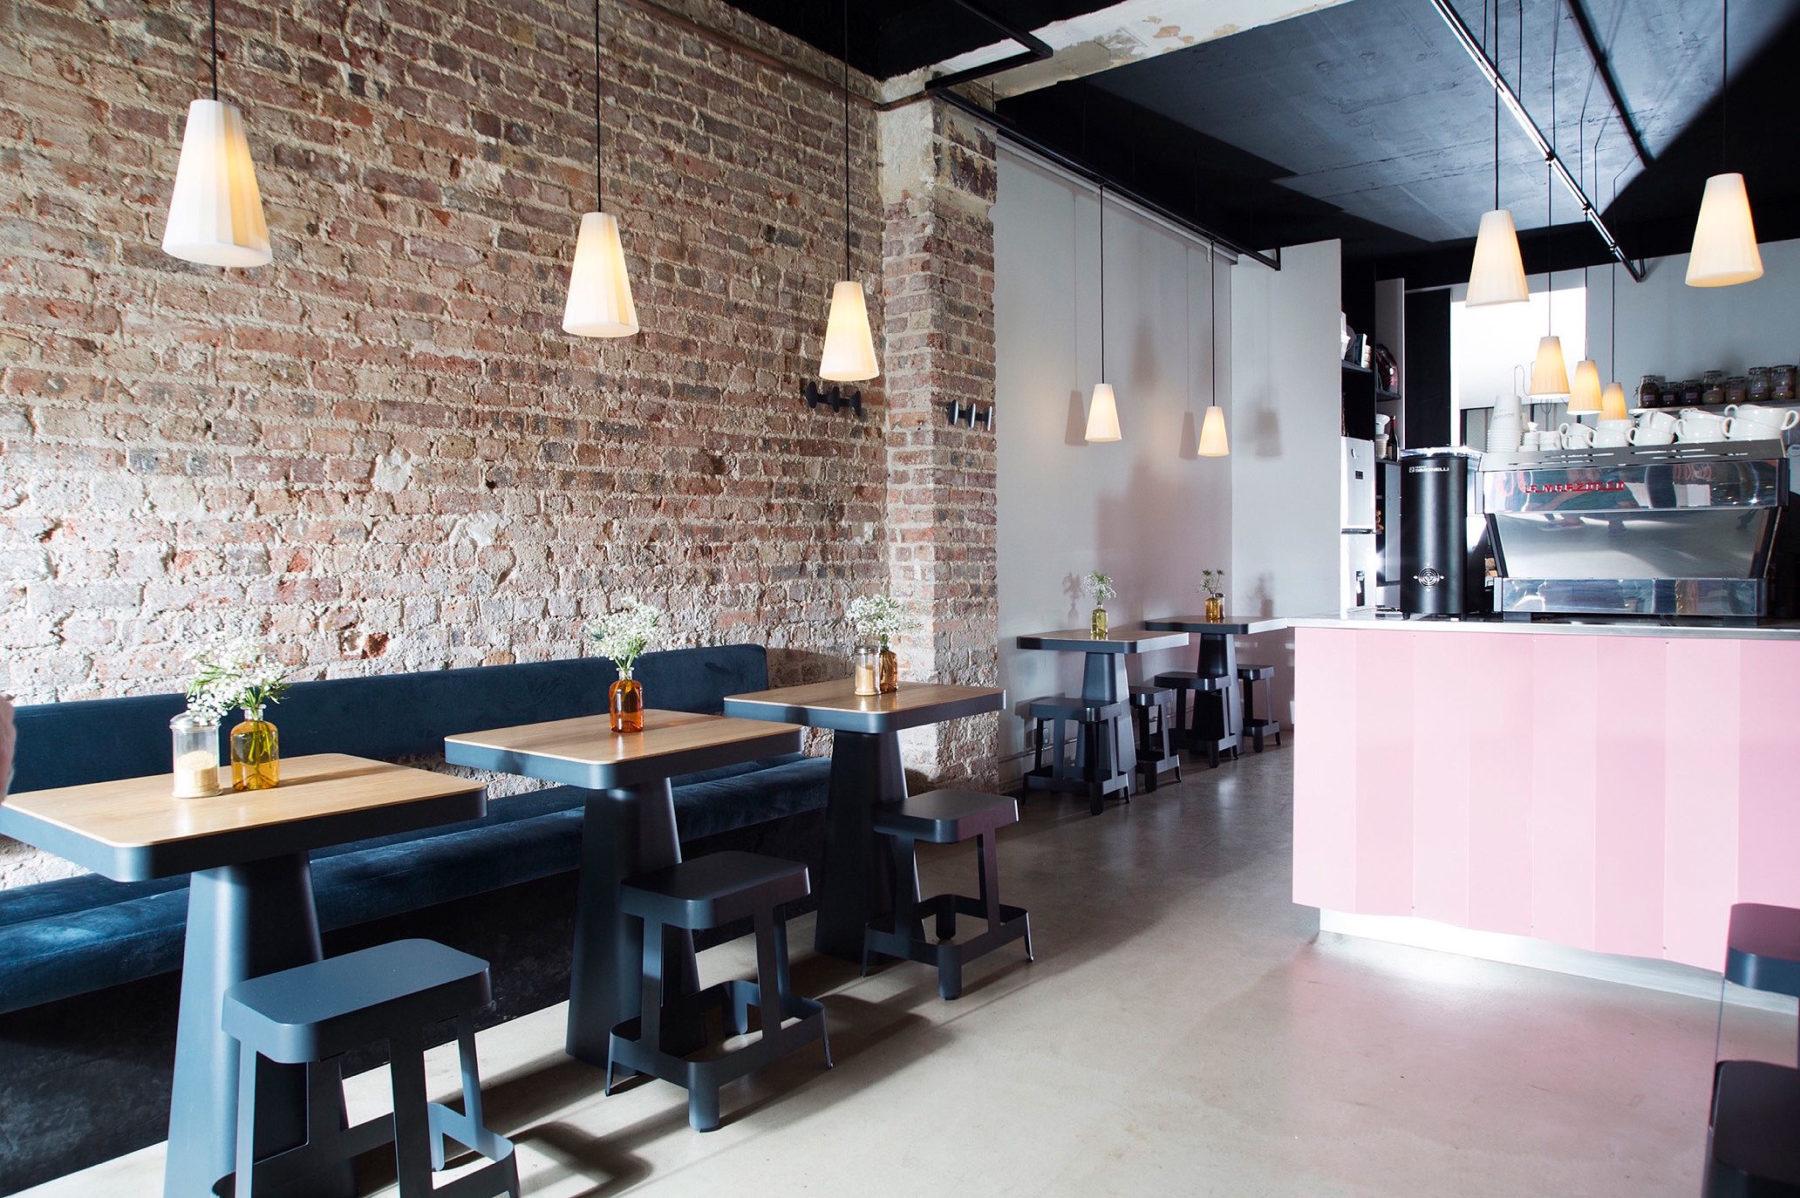 Table et Tabouret PILE - Luminaire KAOLIN - MIGNON Café - KATABA.fr - bold-design.fr